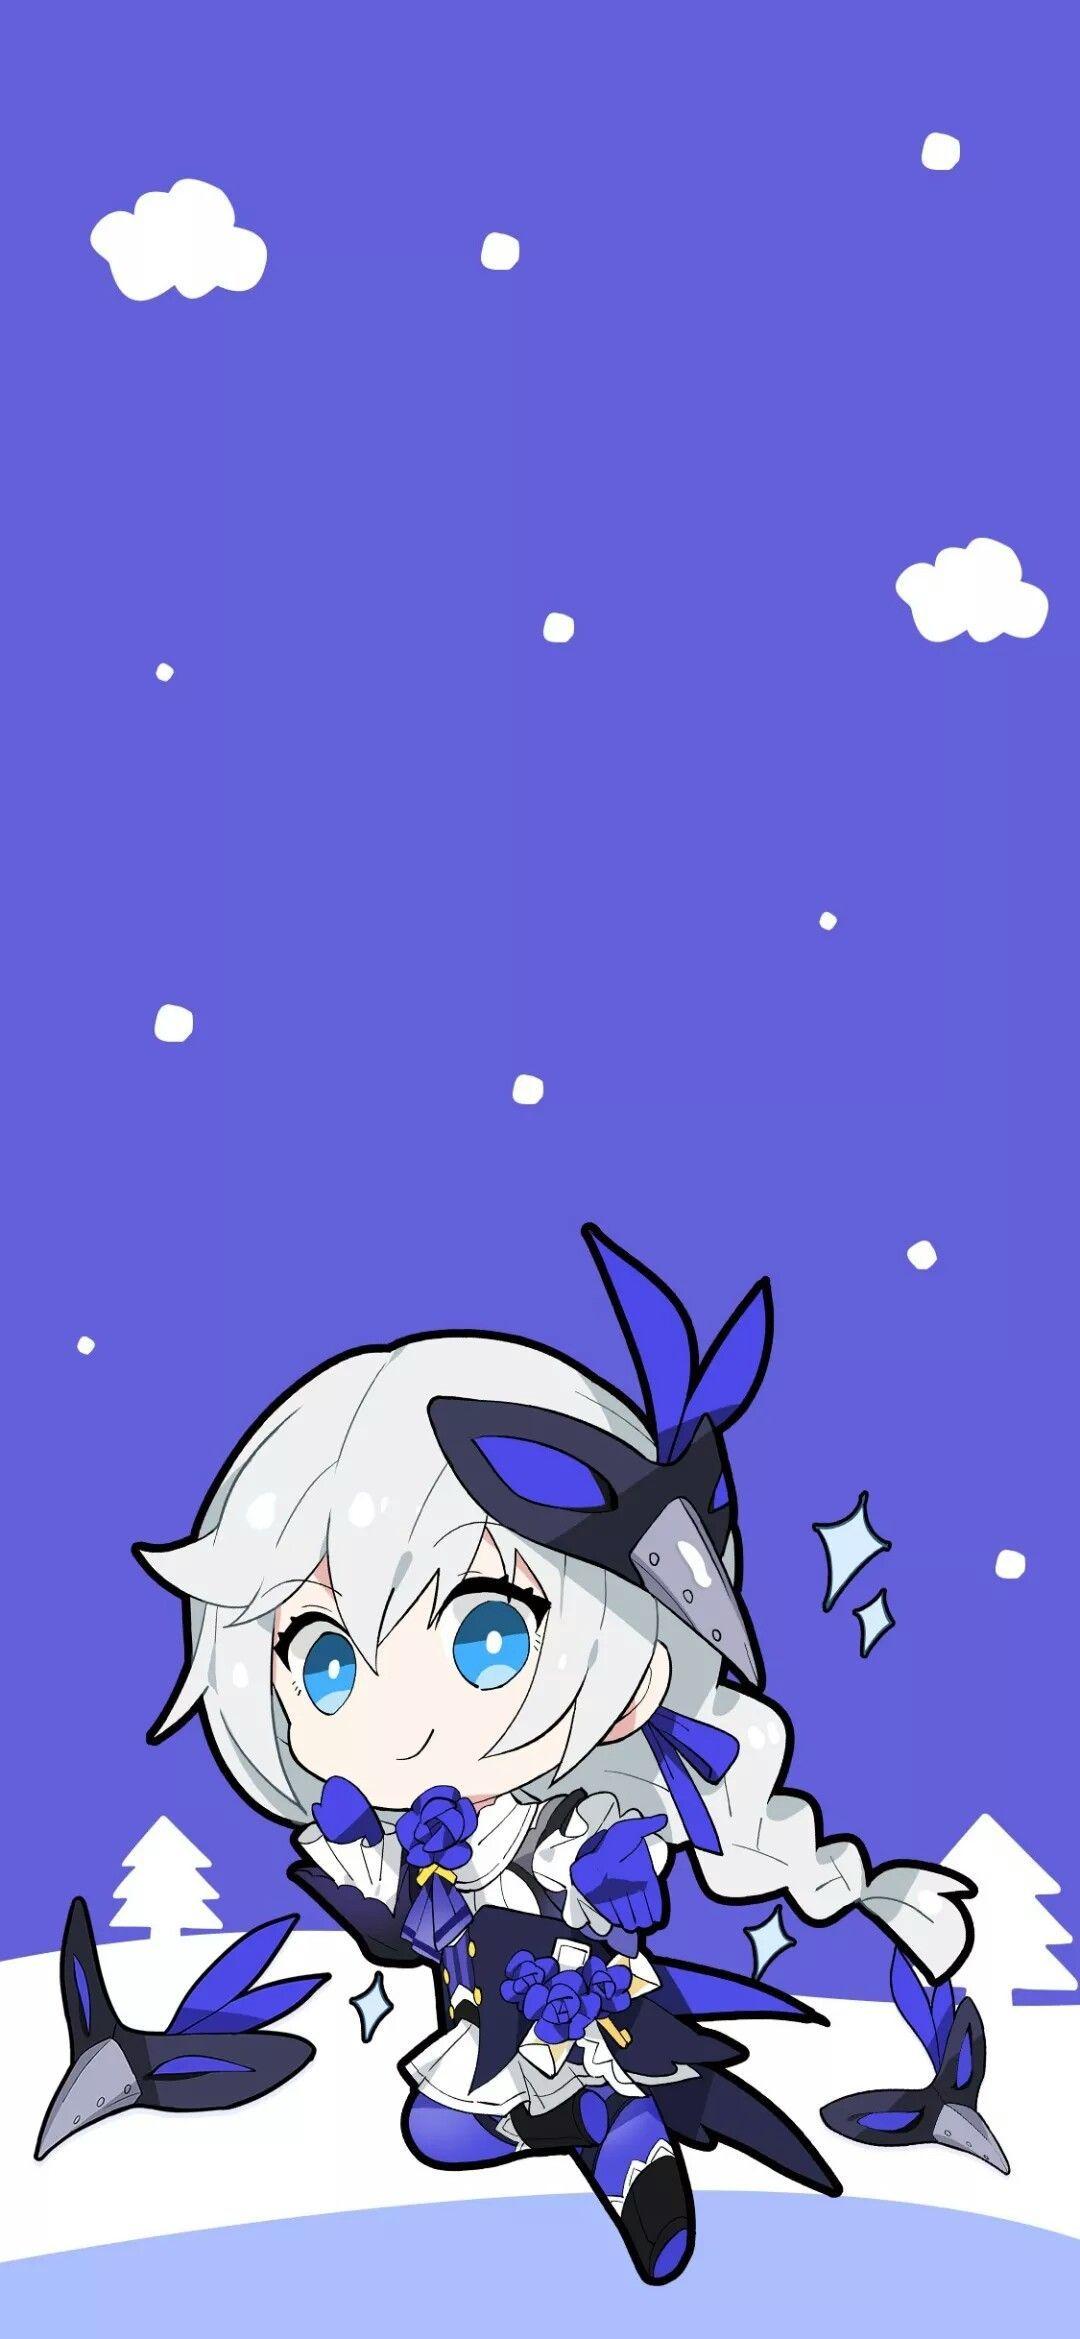 Get Nice Anime Wallpaper IPhone Kawaii Kallan Kaslana in